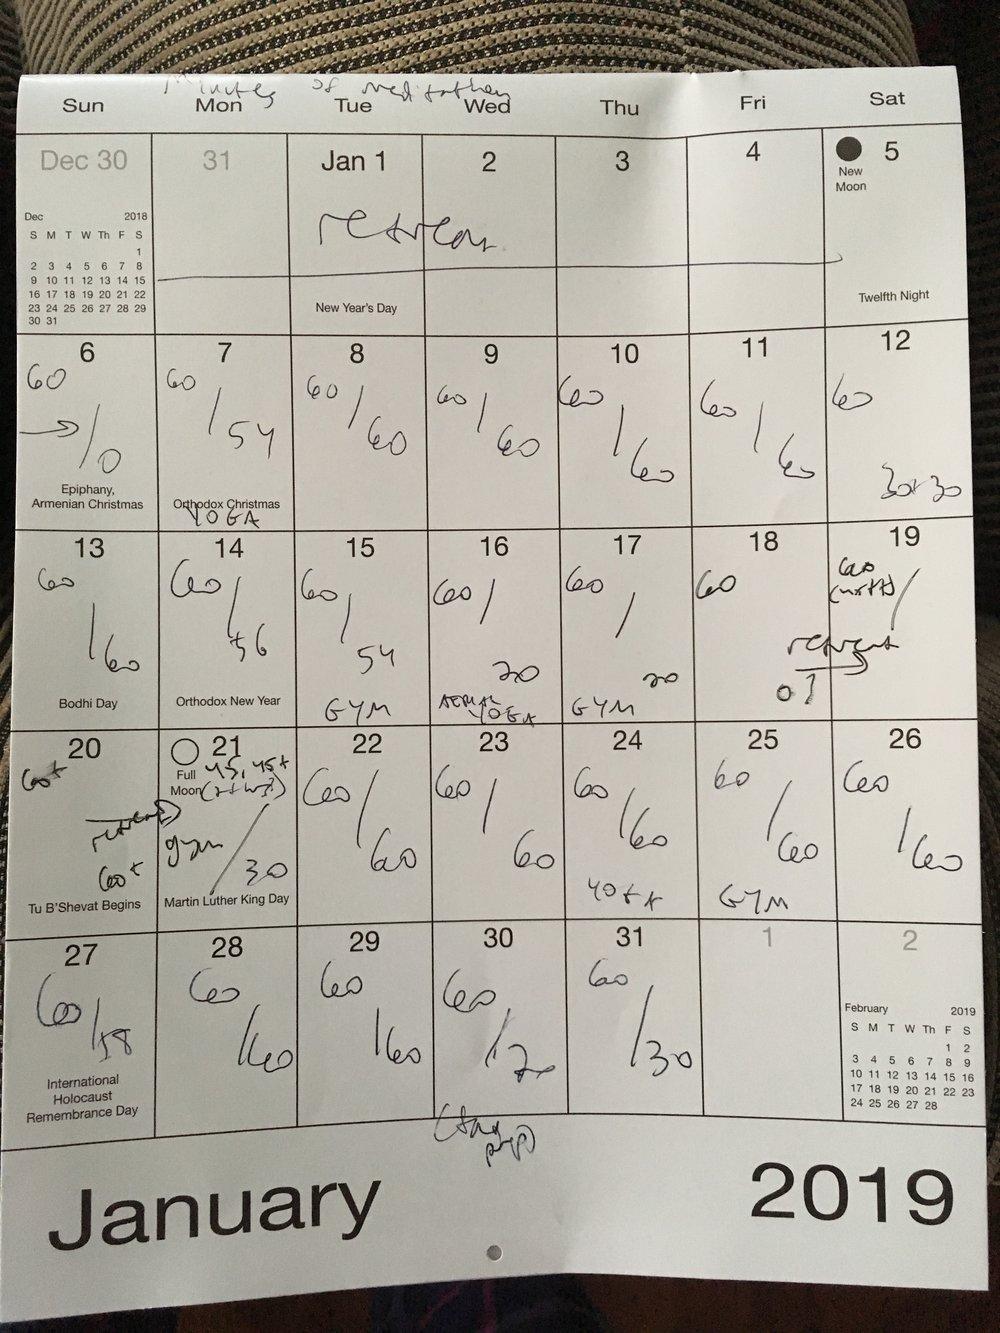 Meditation-January-calendar.JPG